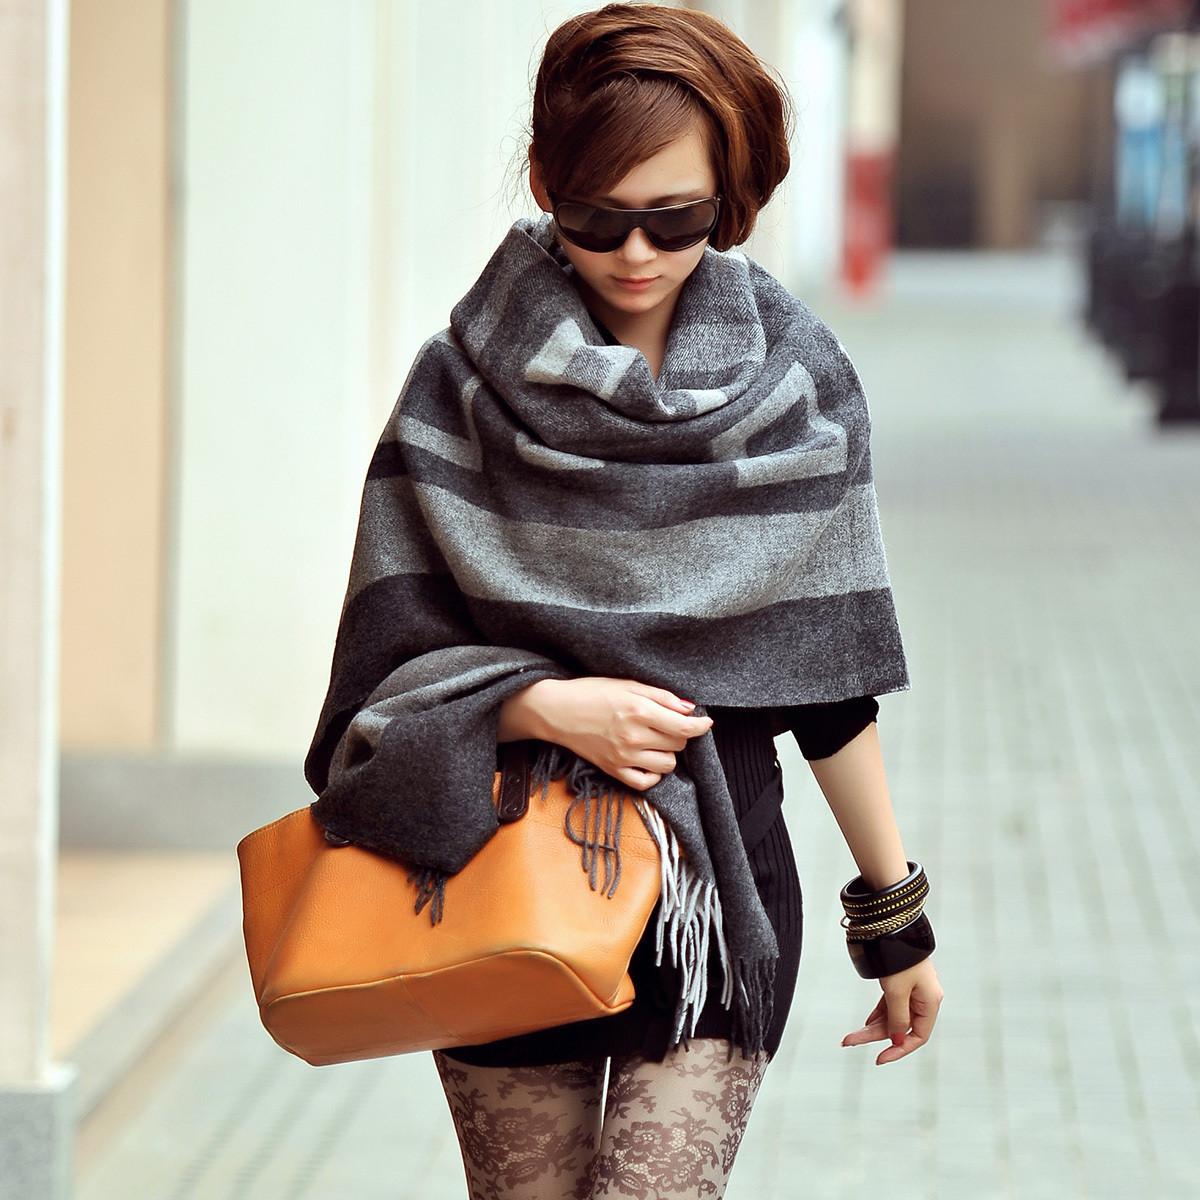 2013N.LIFE新款正品空调房女士格子羊毛披肩围巾两用加大加厚秋冬 价格:258.00